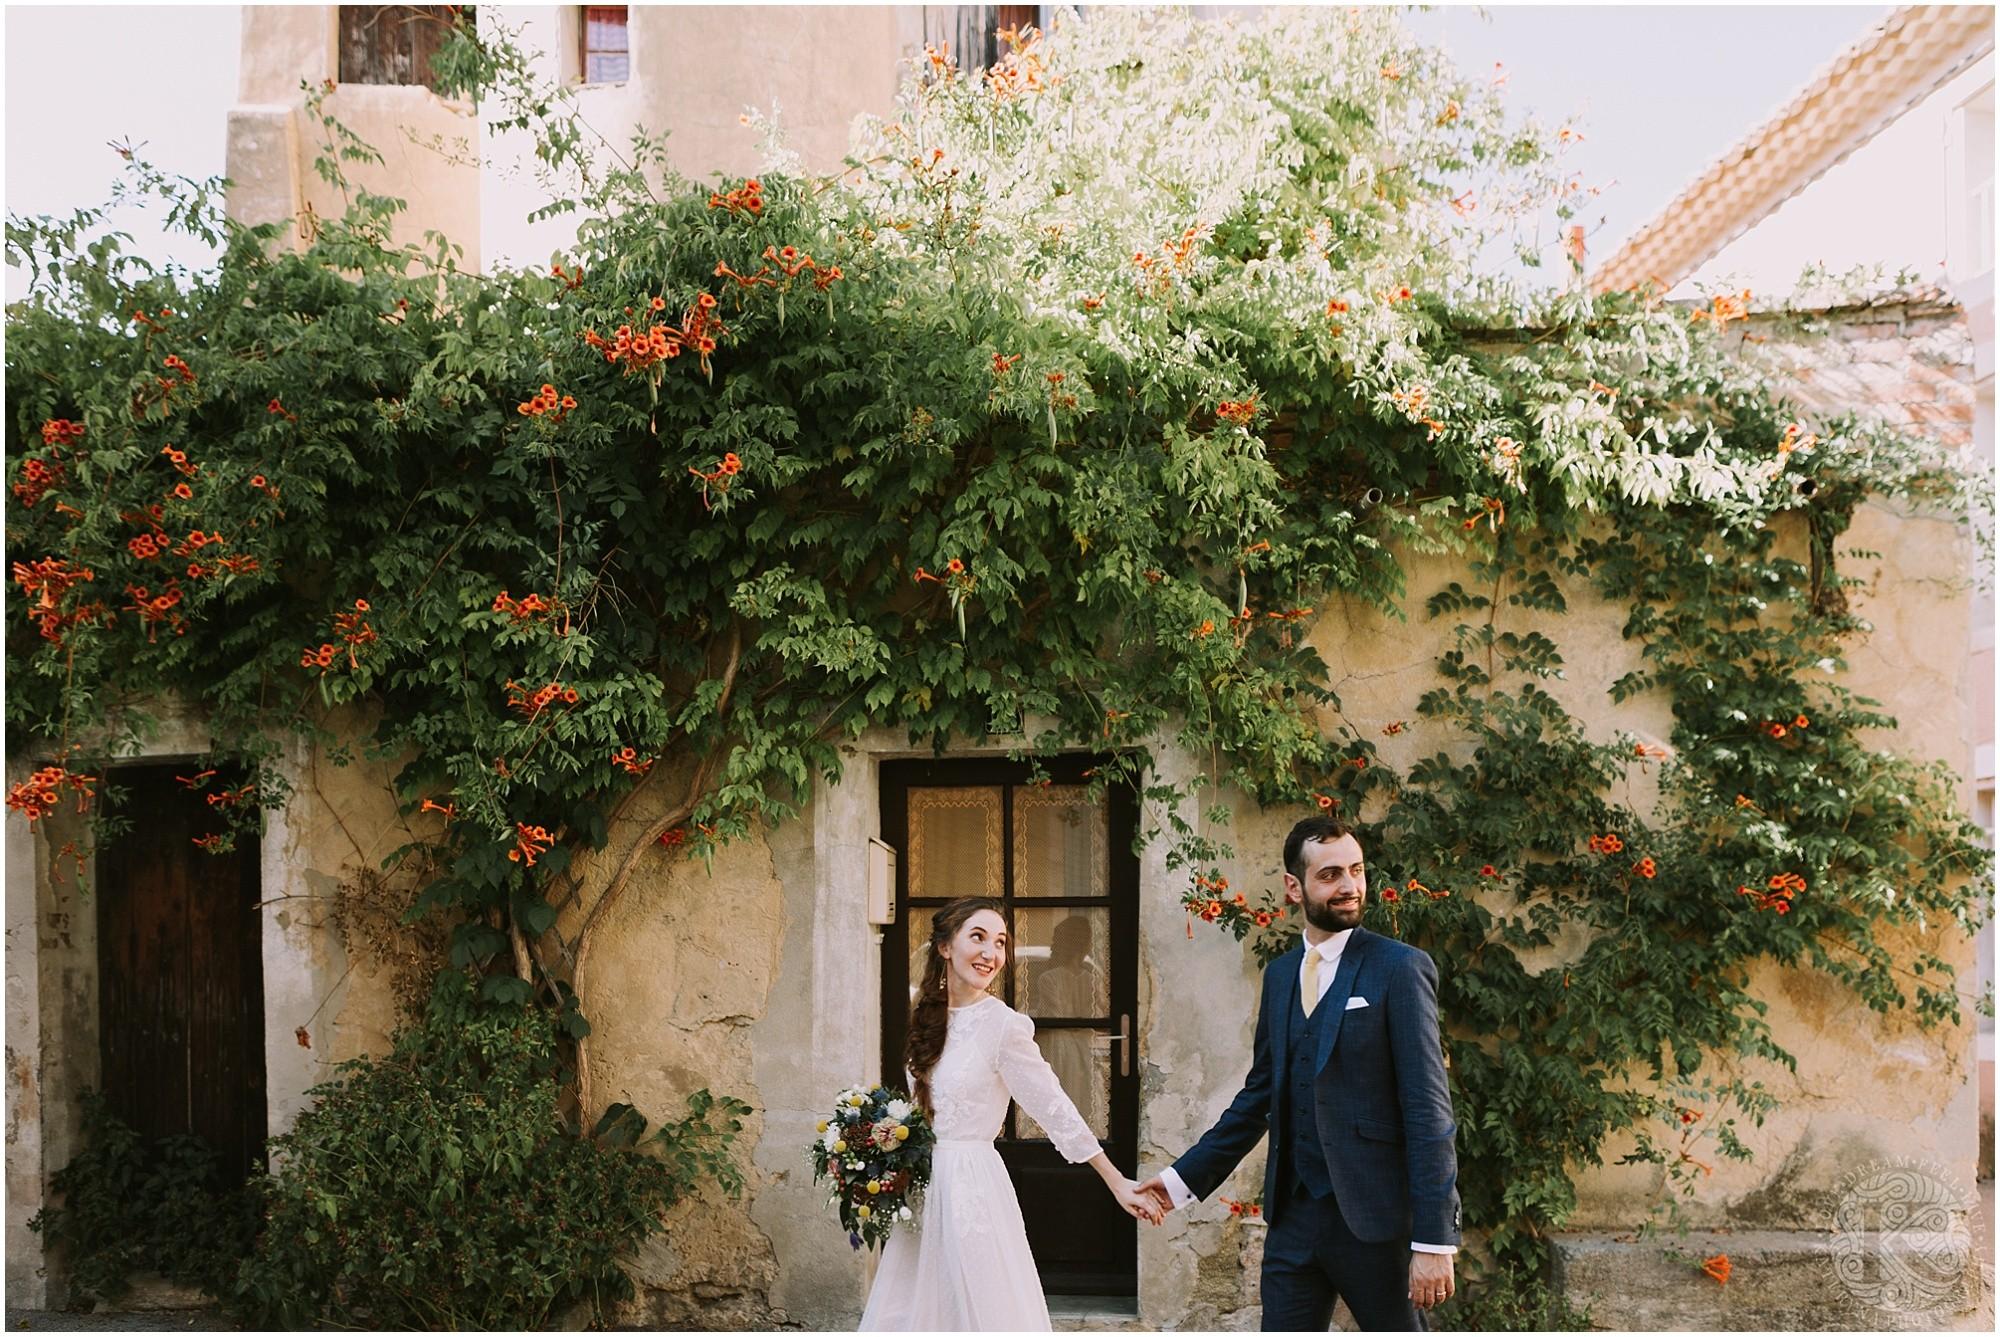 Kateryna-photos-photographe-mariage-vaucluse-provence-avignon-ferme-st-hugues_0049.jpg